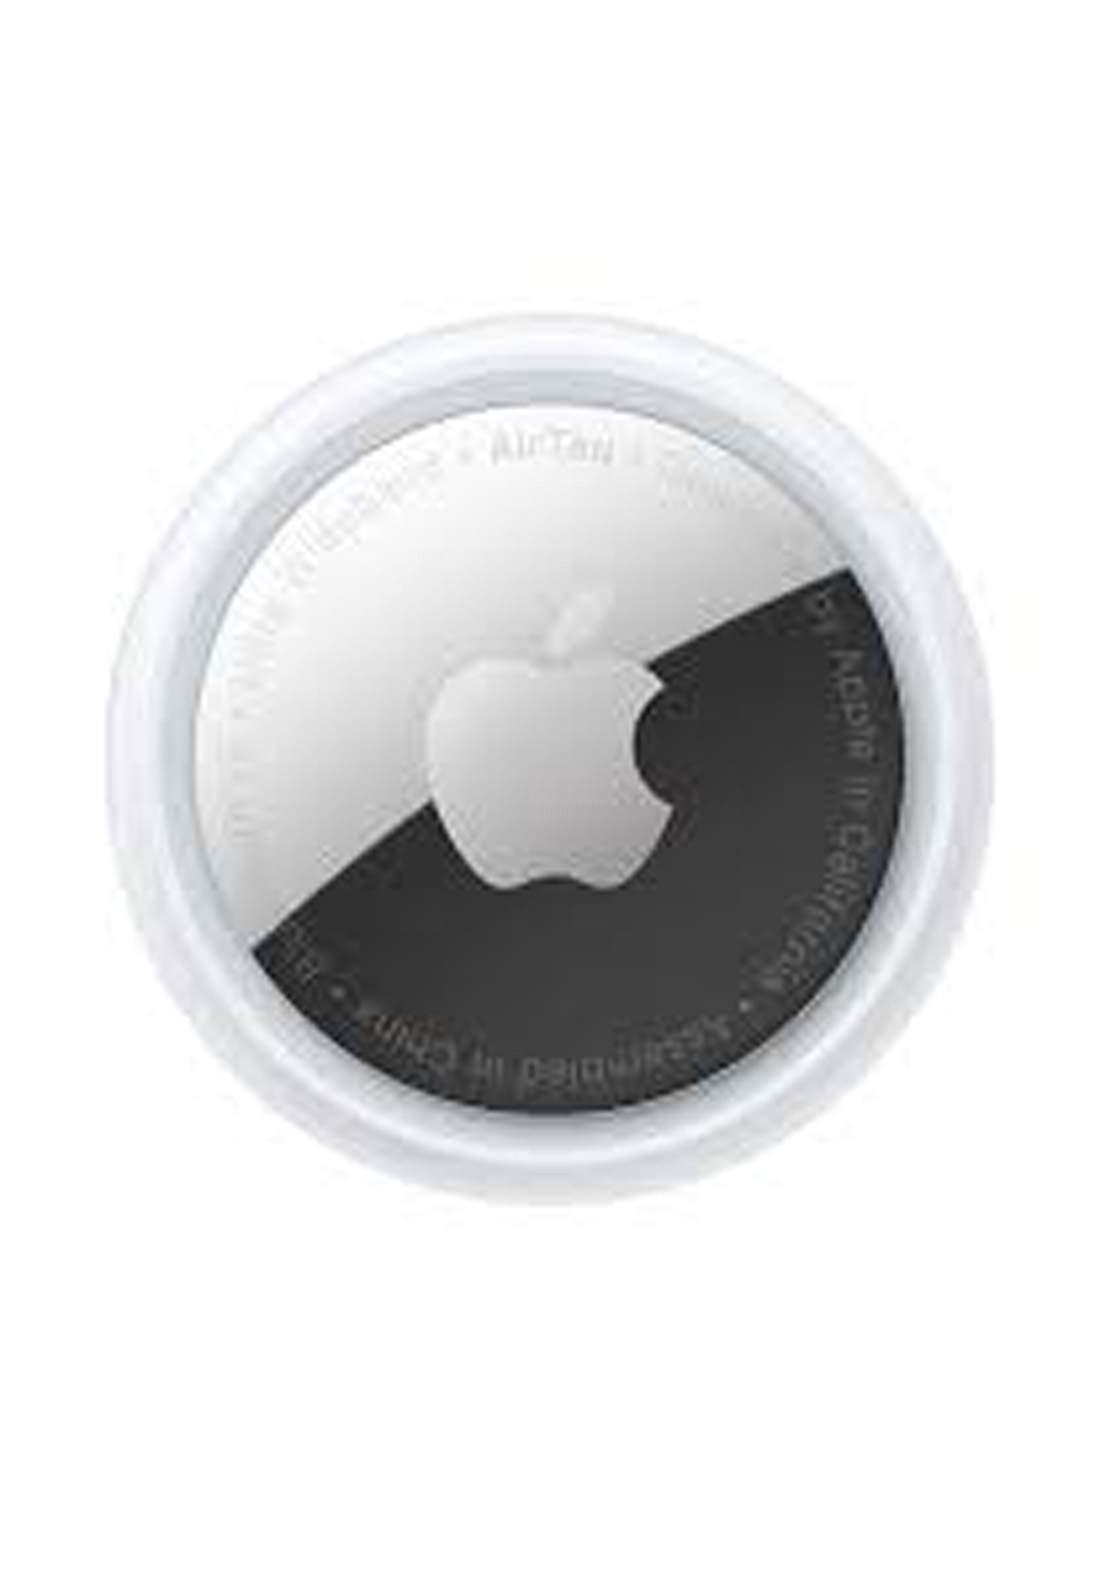 Apple A2187 AirTag Wireless Tracker - White